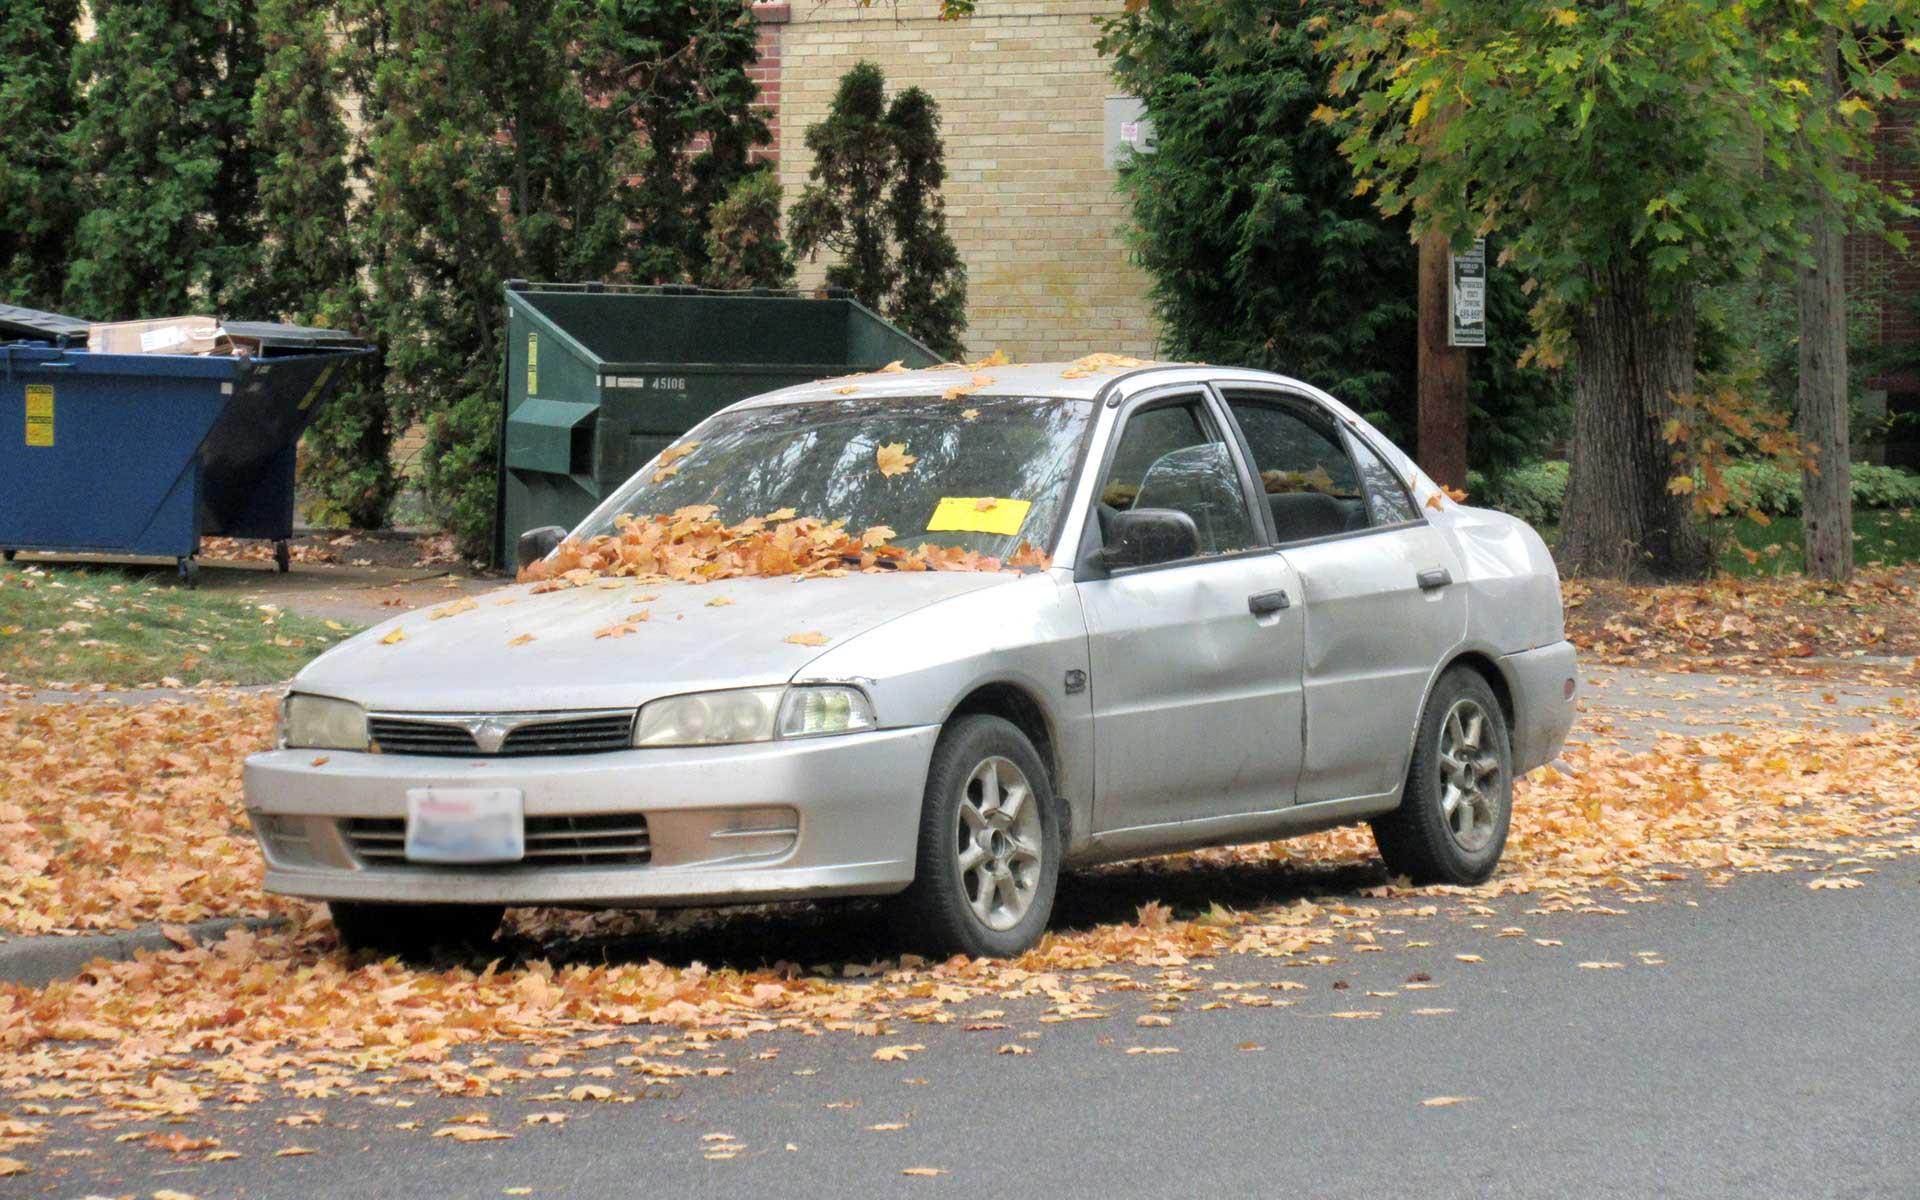 What Happens To Abandoned Vehicles City Of Spokane Washington